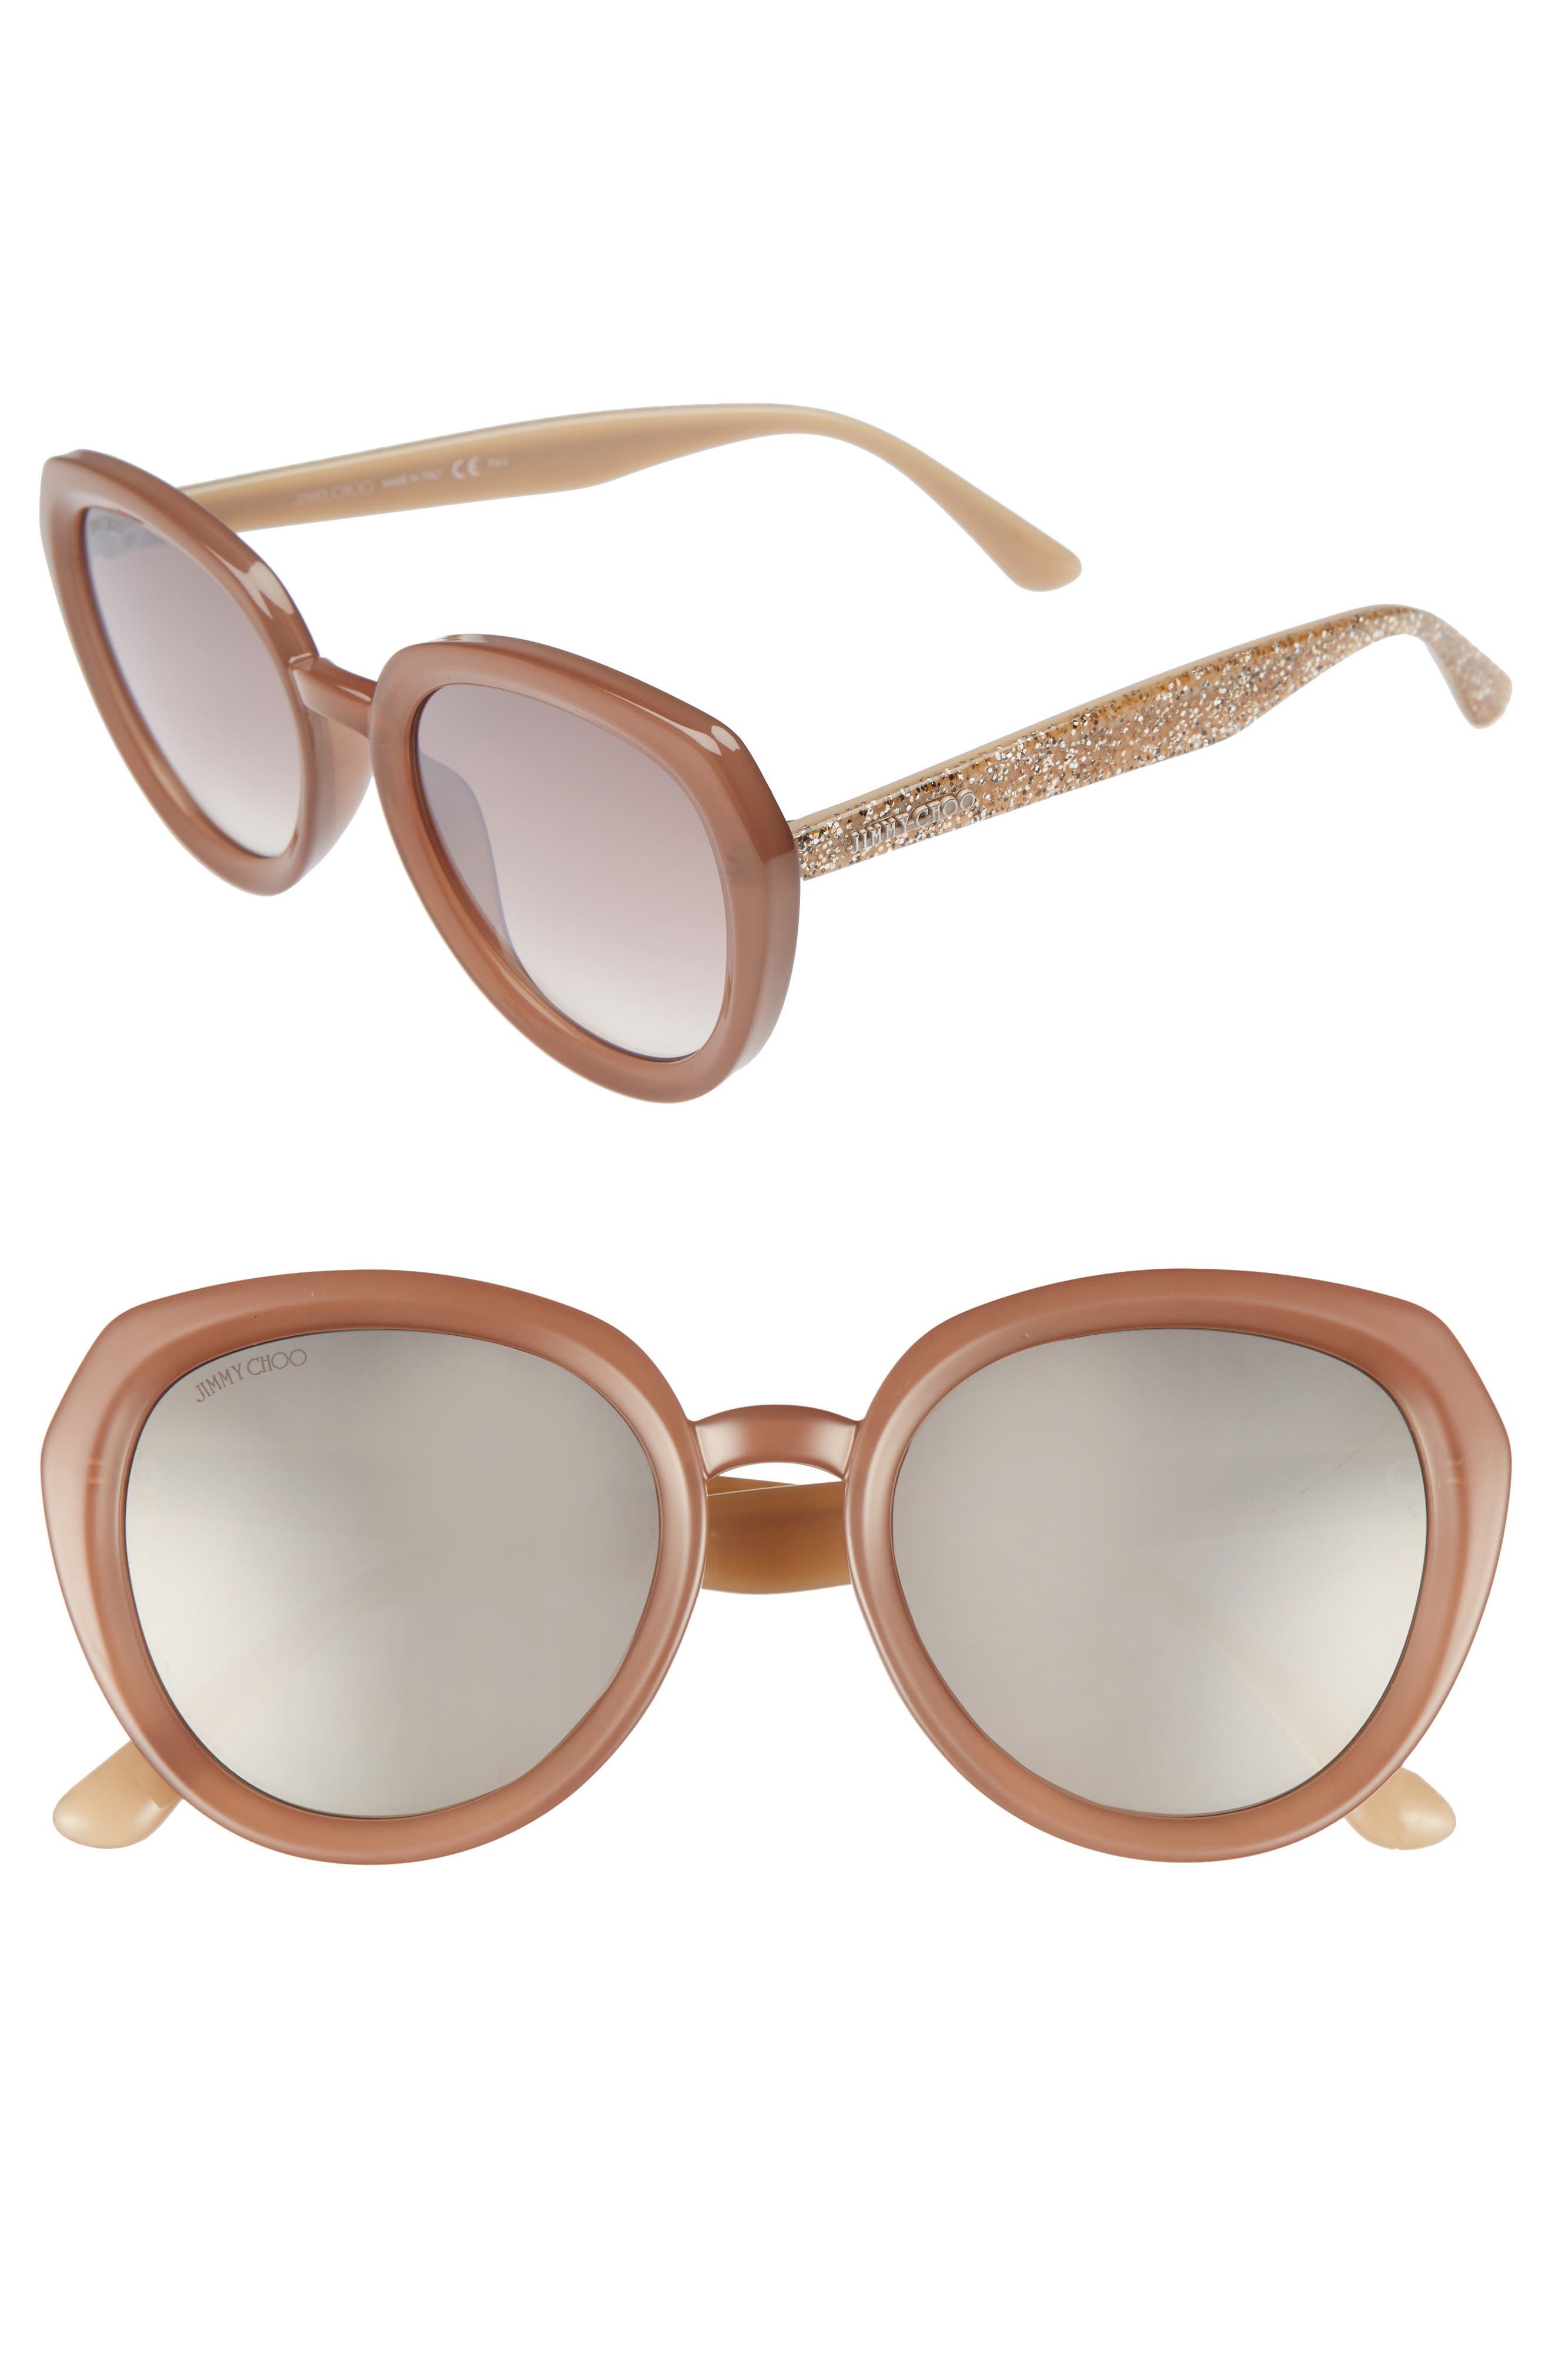 Alternate Image 1 Selected - Jimmy Choo Maces 53mm Oversize Sunglasses